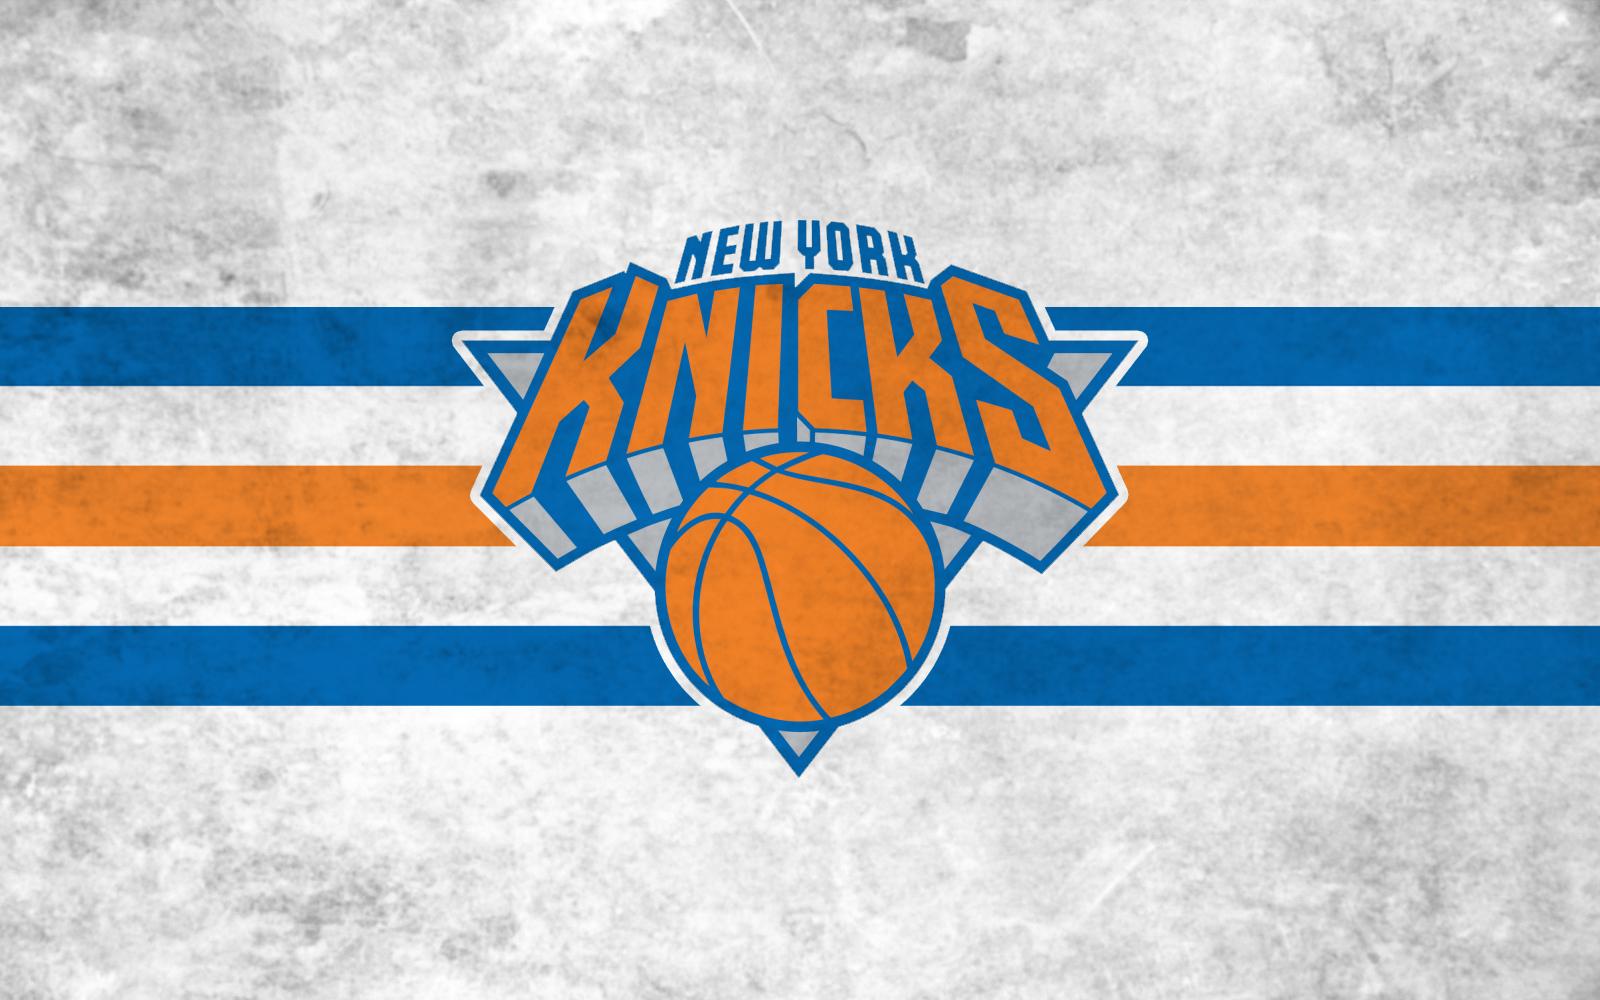 New york knicks iphone wallpaper hd.